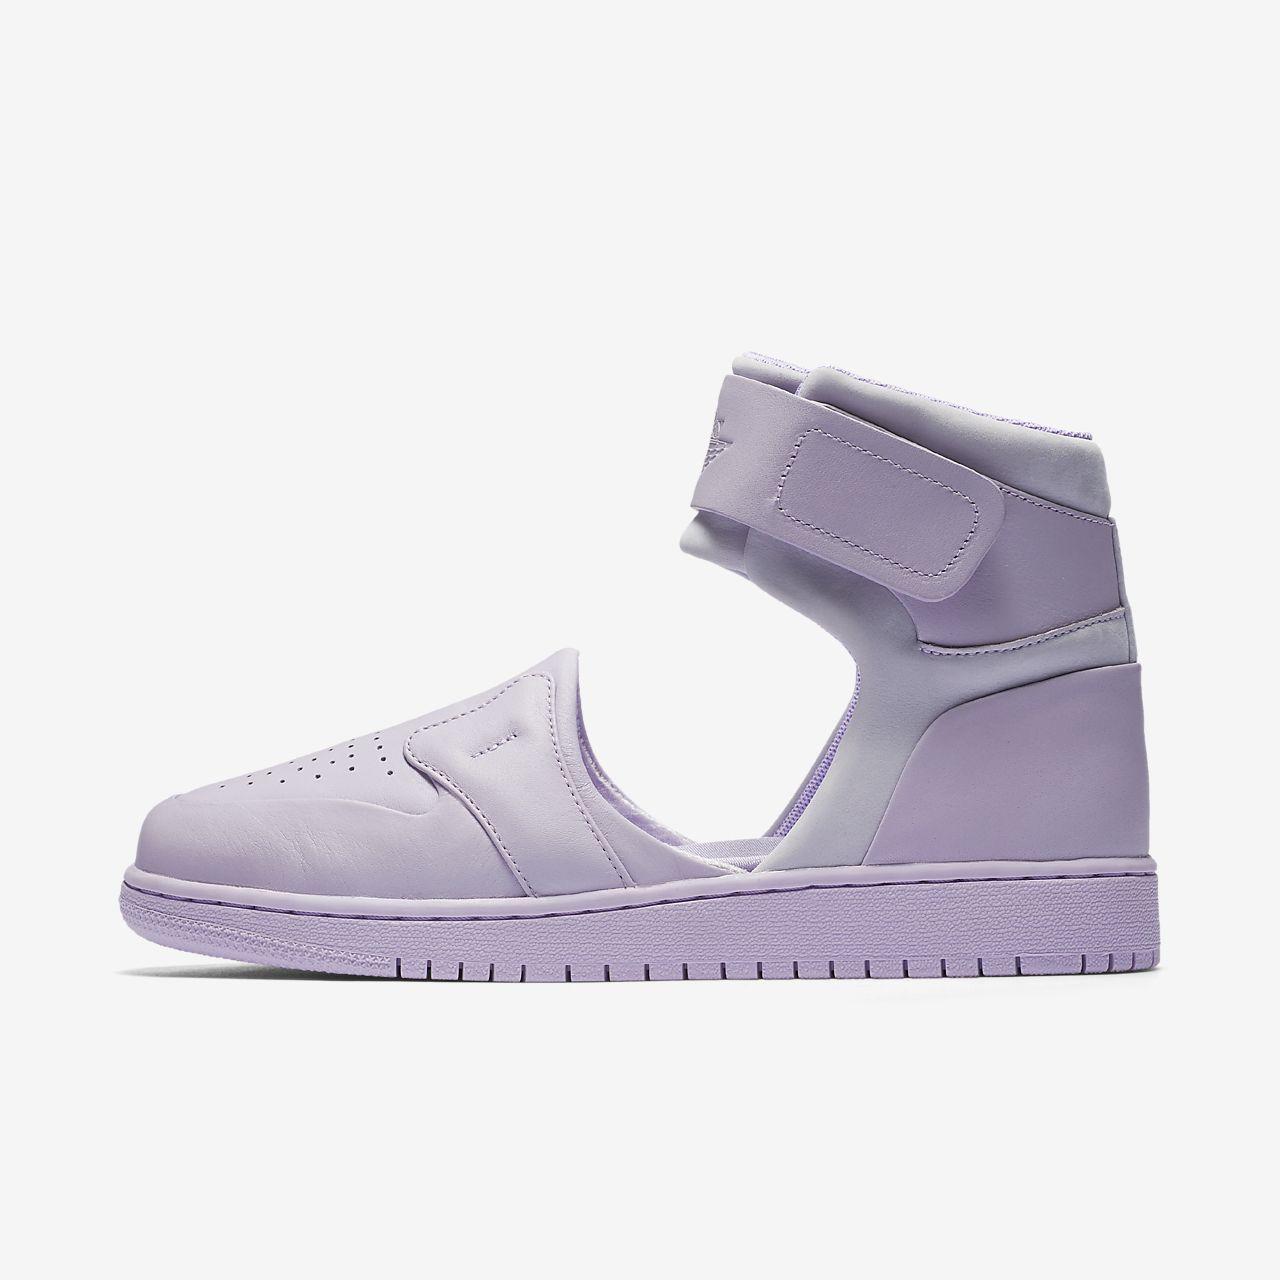 1672843f5a8c Jordan AJ1 Lover XX Women s Shoe. Nike.com ZA